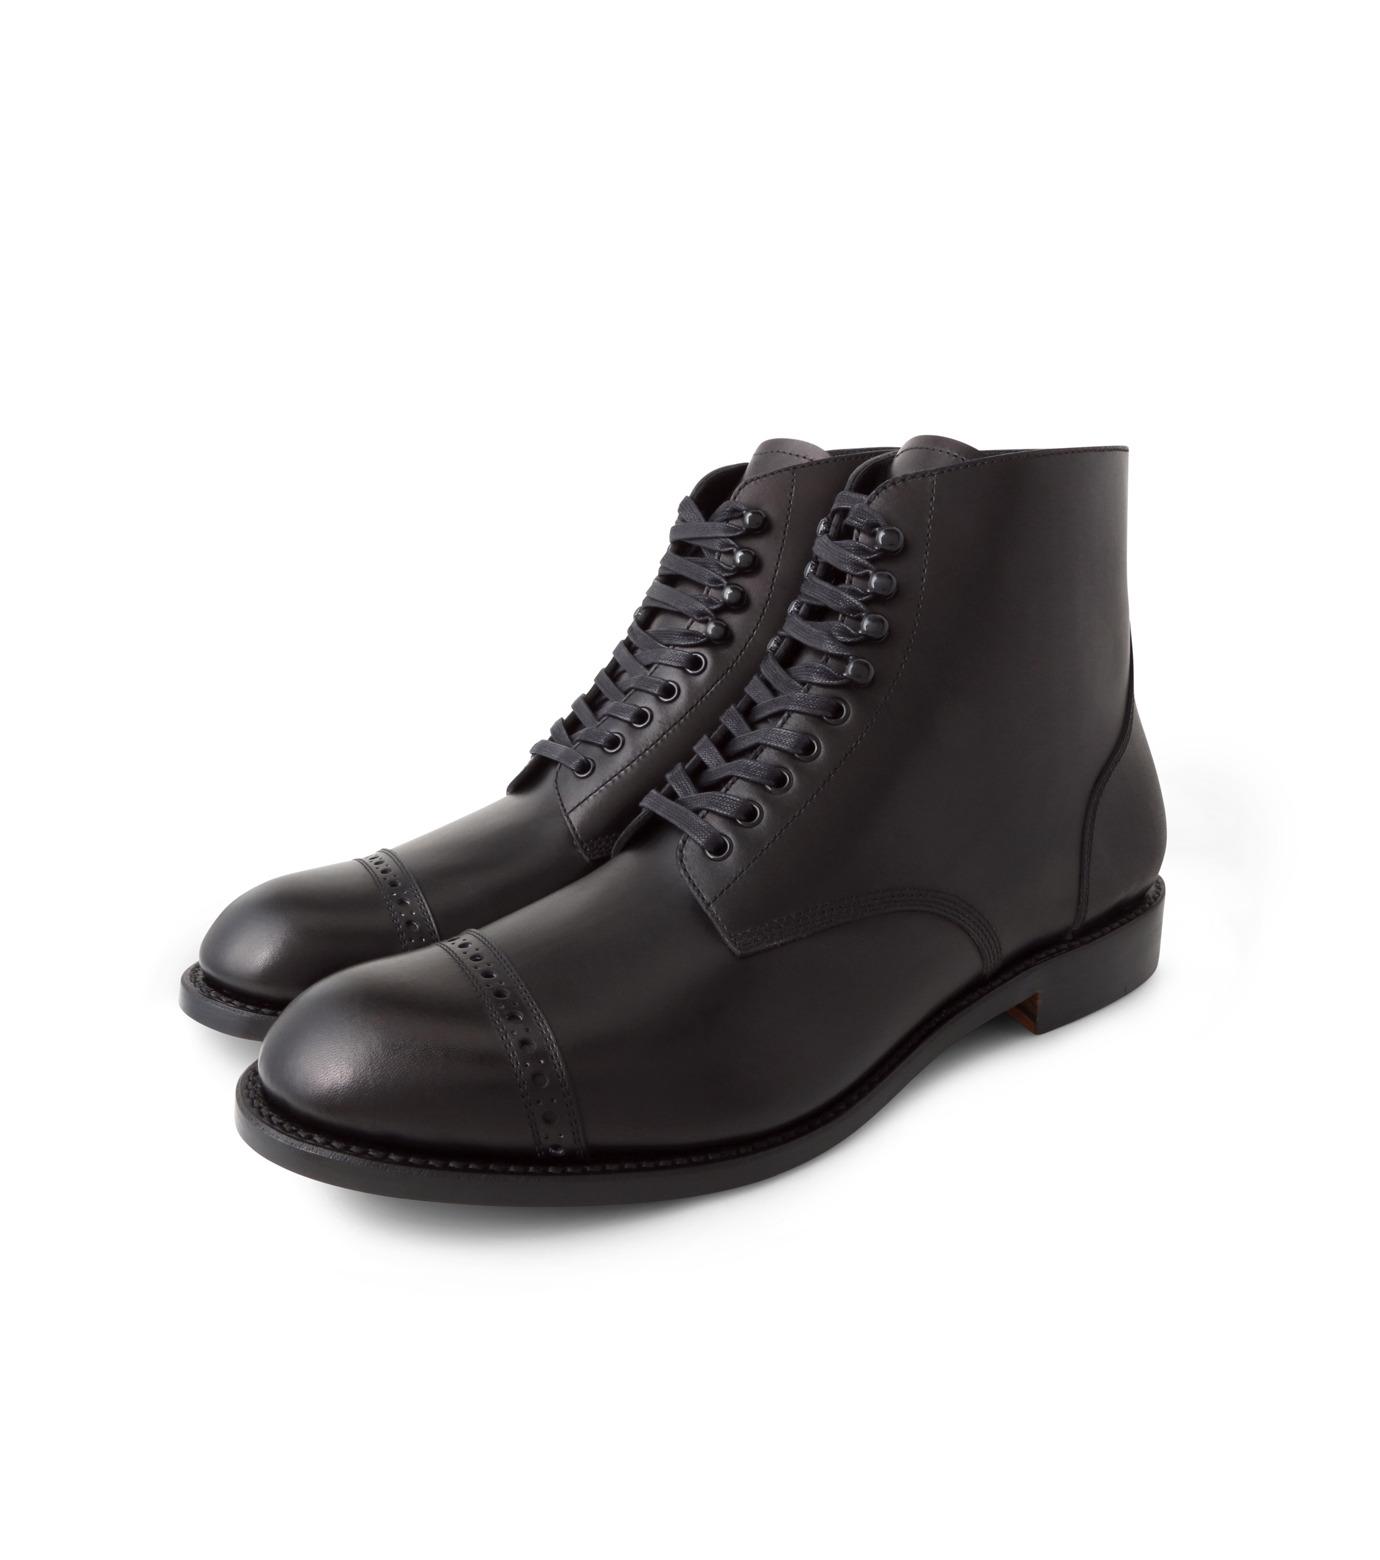 RAINMAKER(レインメーカー)のm42 boots-BLACK(ブーツ/boots)-RM162-019-13 拡大詳細画像3